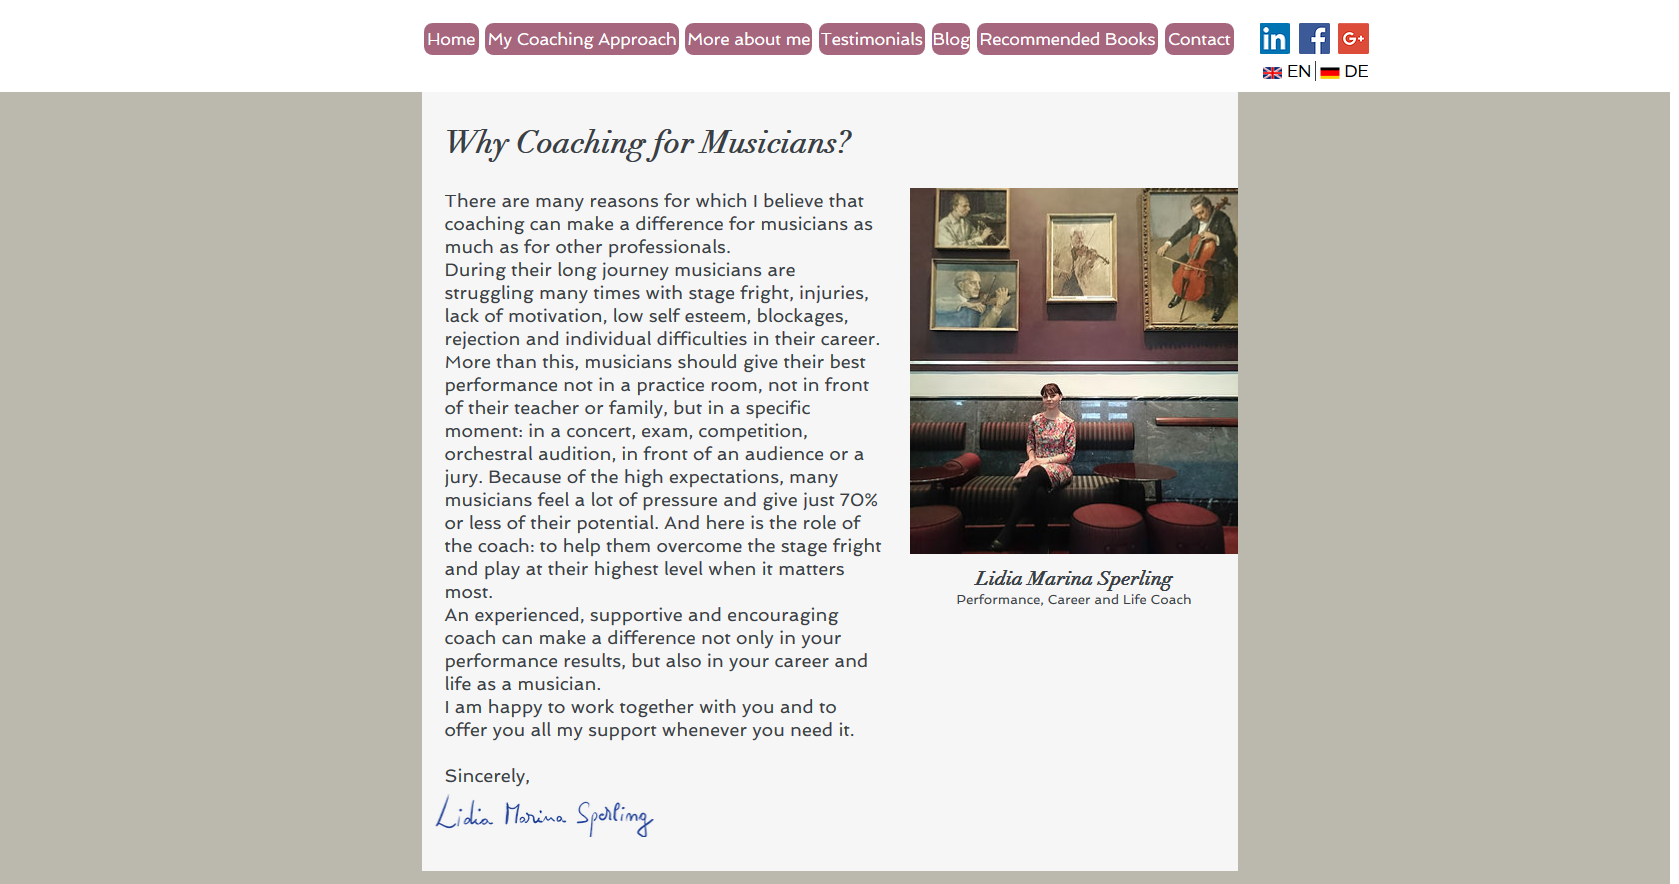 Website: www.coaching-for-musicians.com